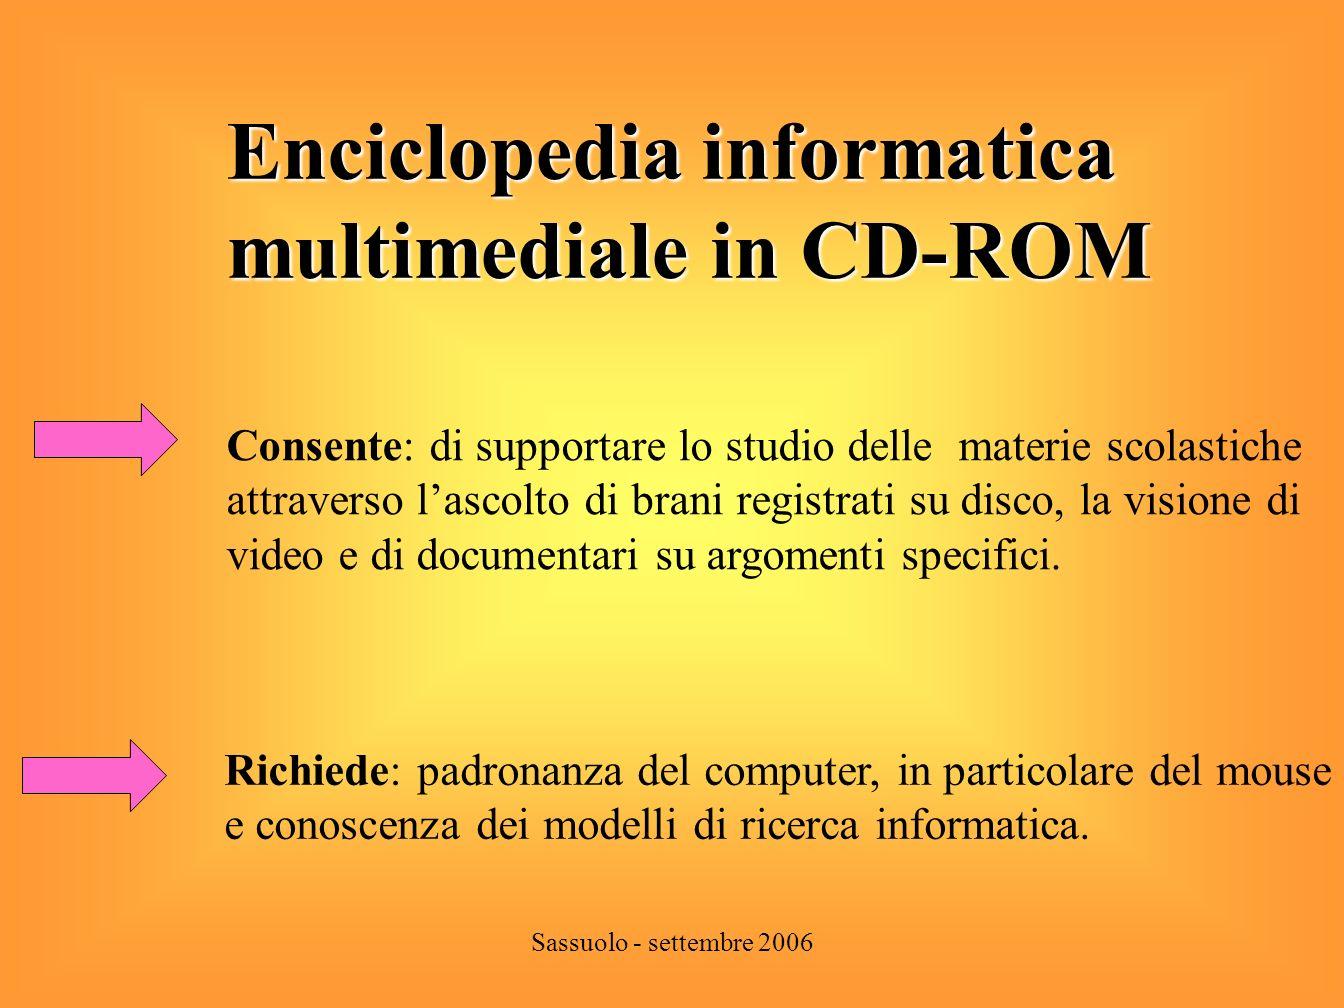 Enciclopedia informatica multimediale in CD-ROM